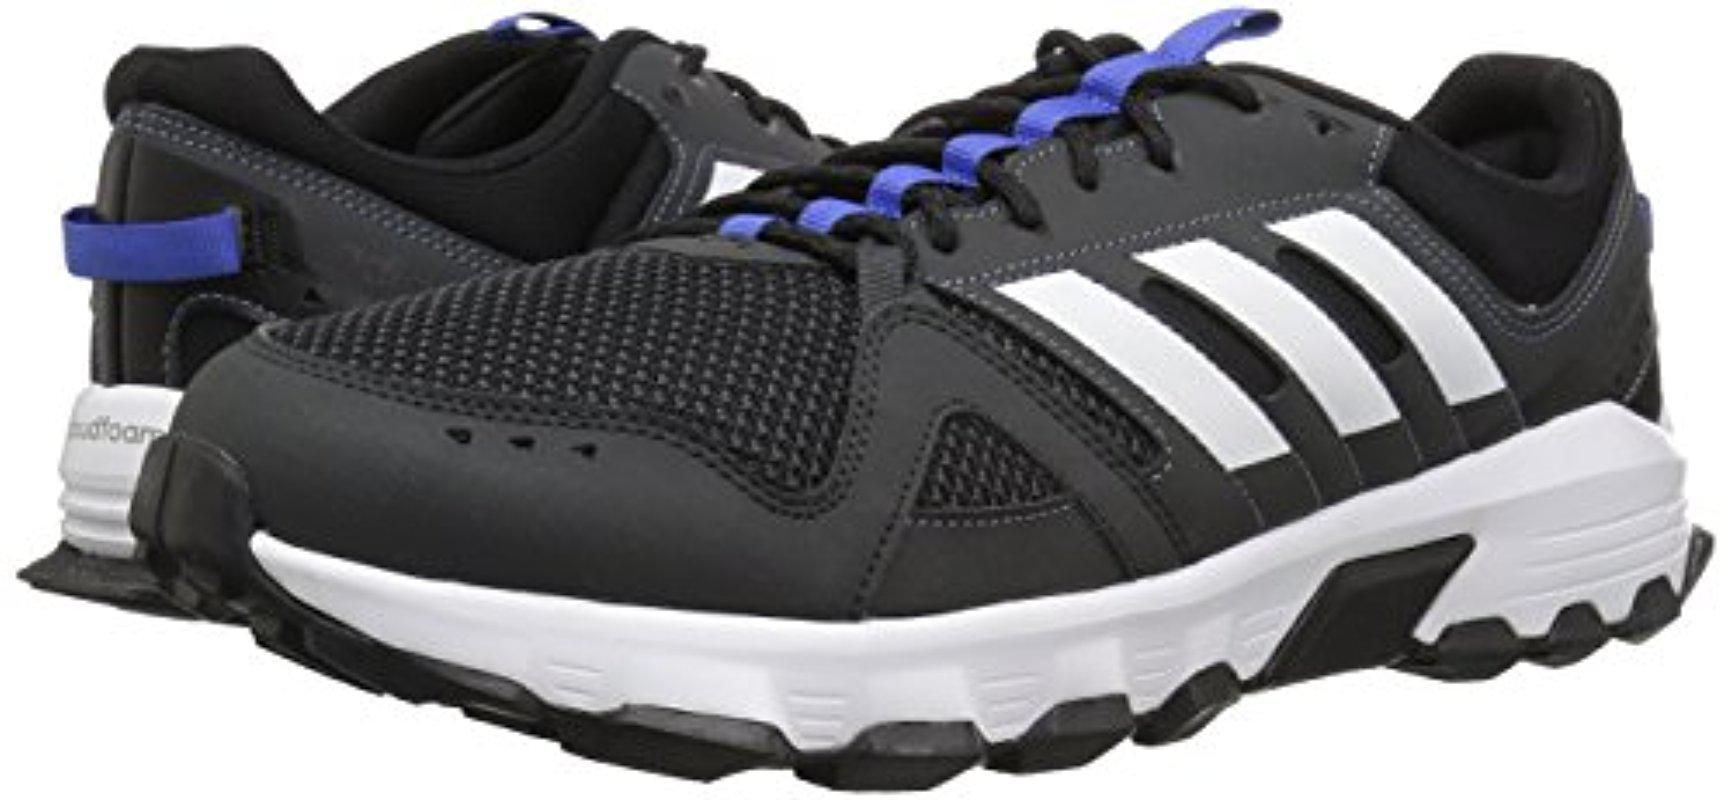 adidas Rockadia Trail M for Men - Lyst